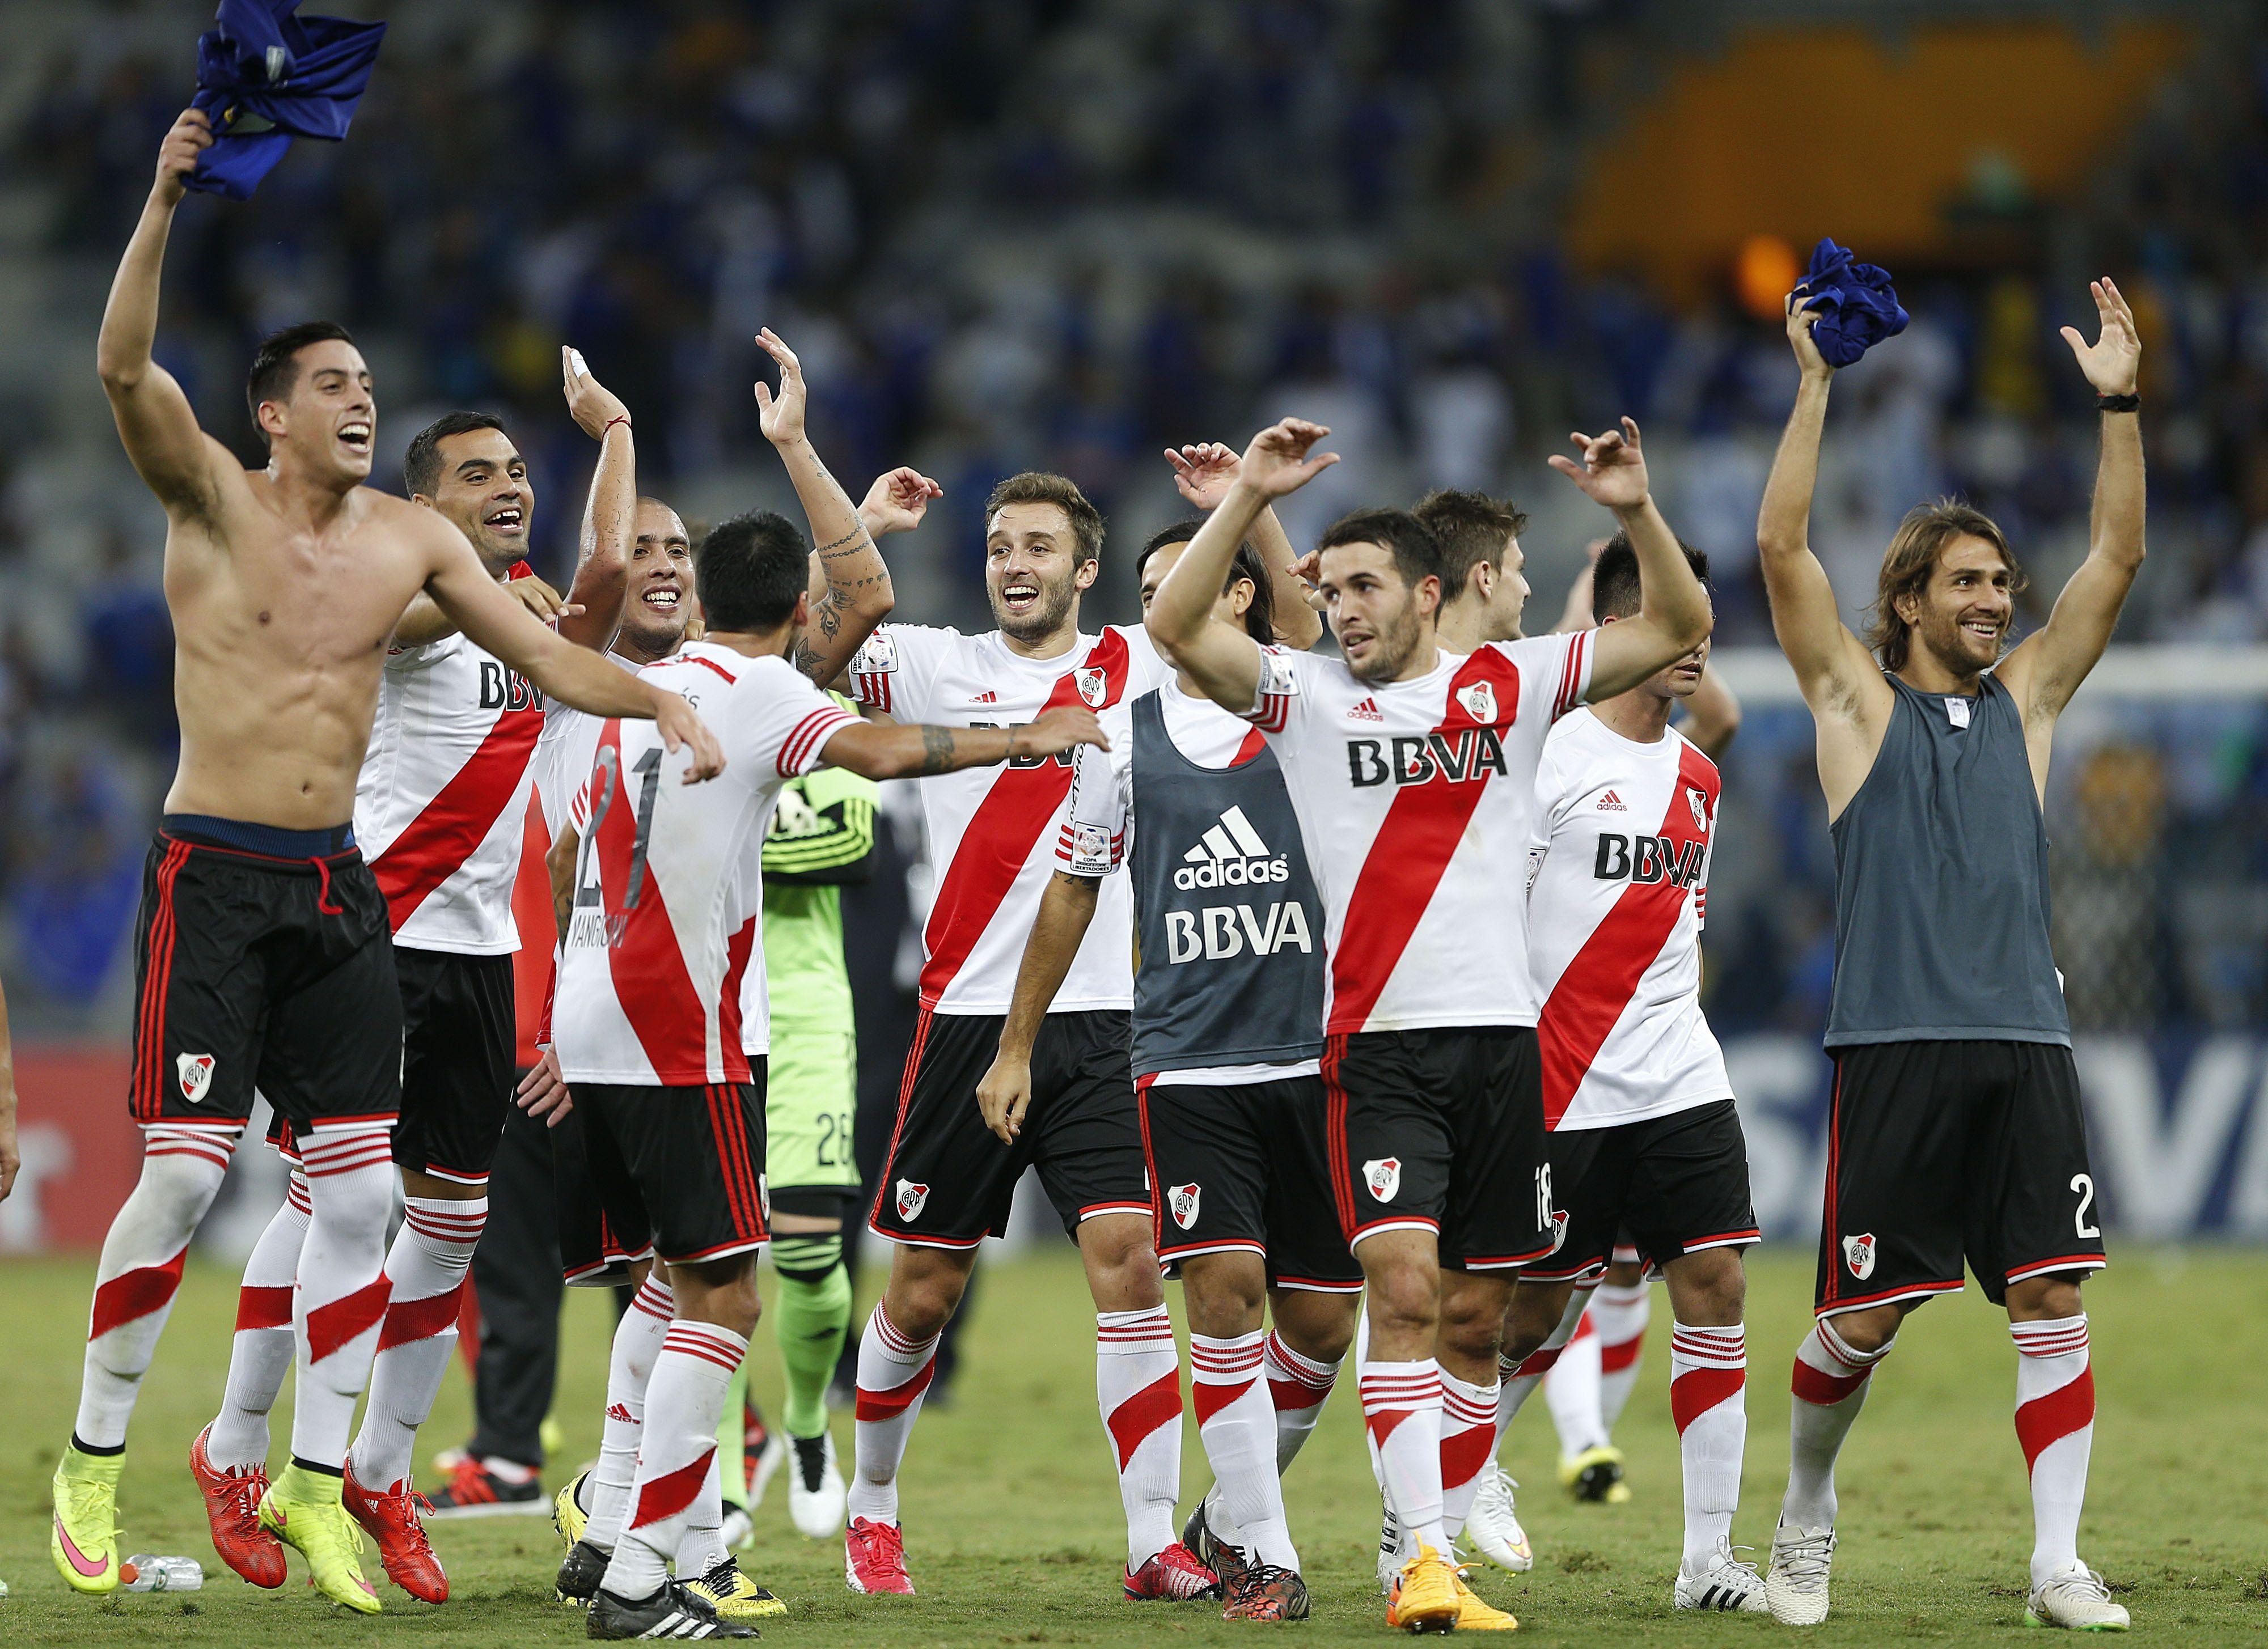 Festejemo' #River #Cruzeiro #Libertadores